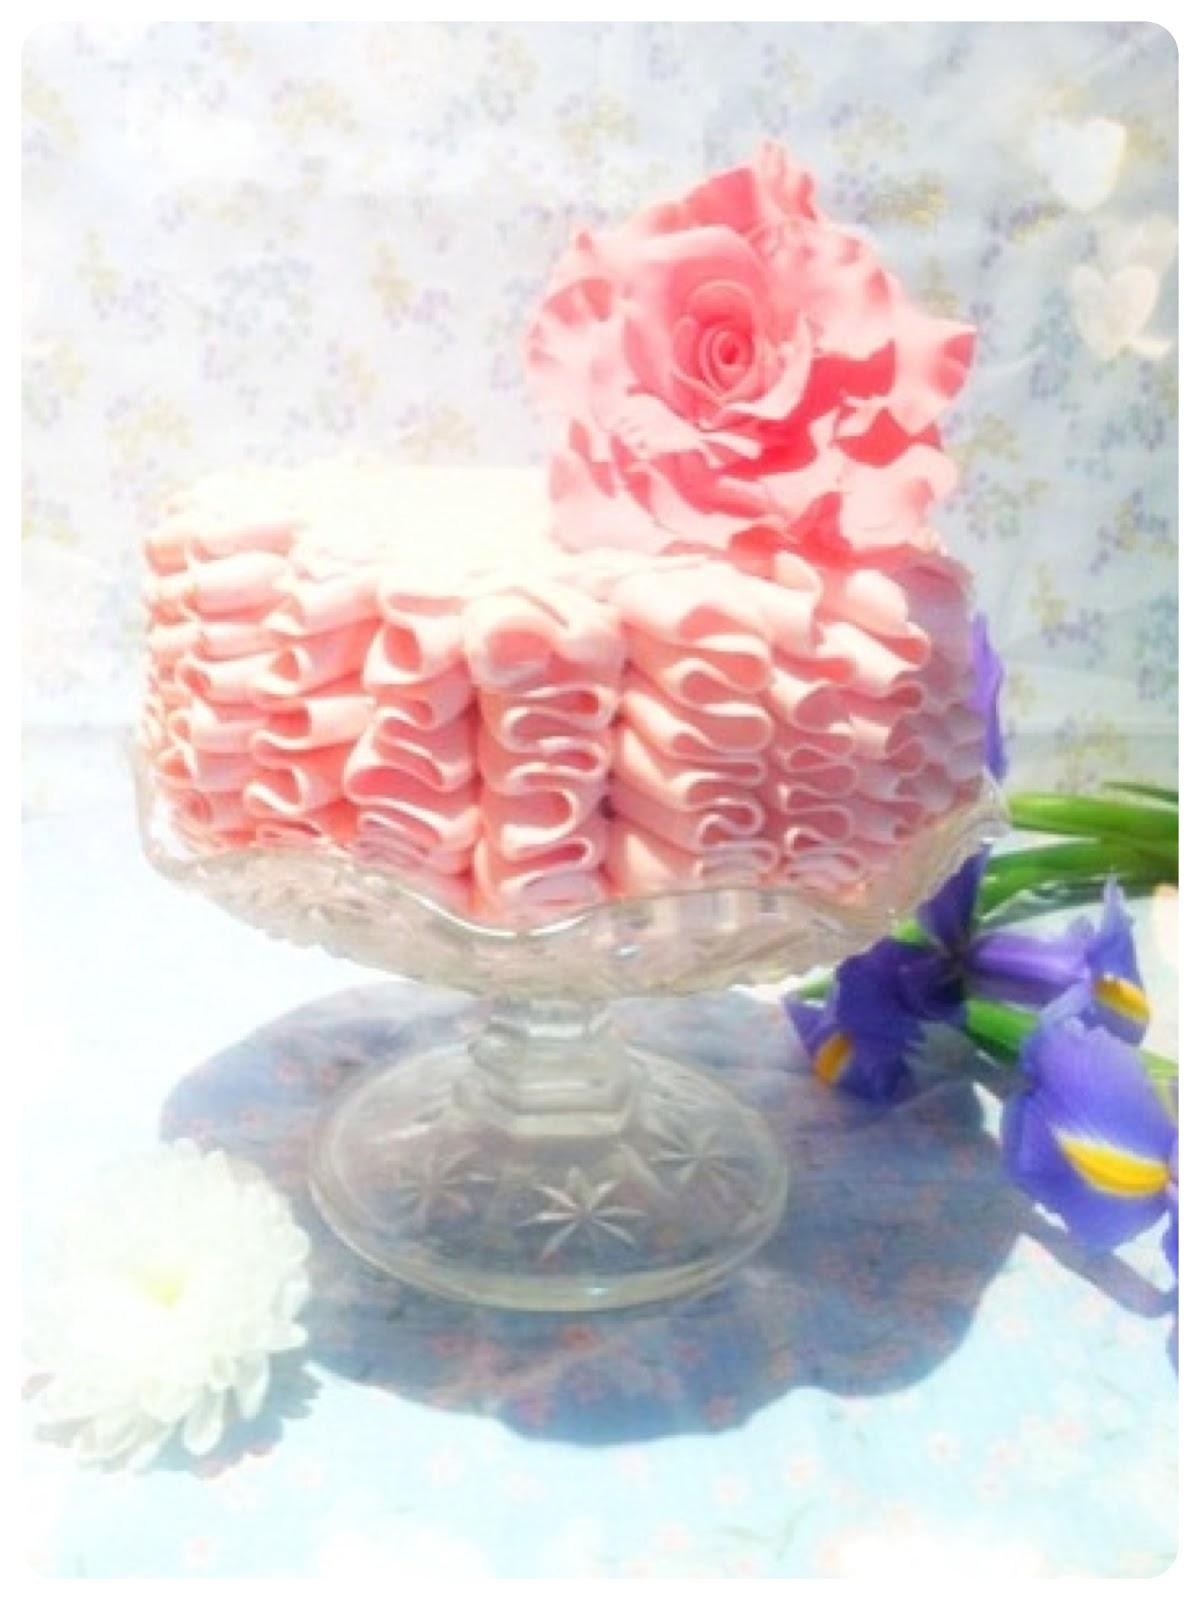 Victoria Sponge Ruffle Cake Birthday Cake London Cherie Kelly